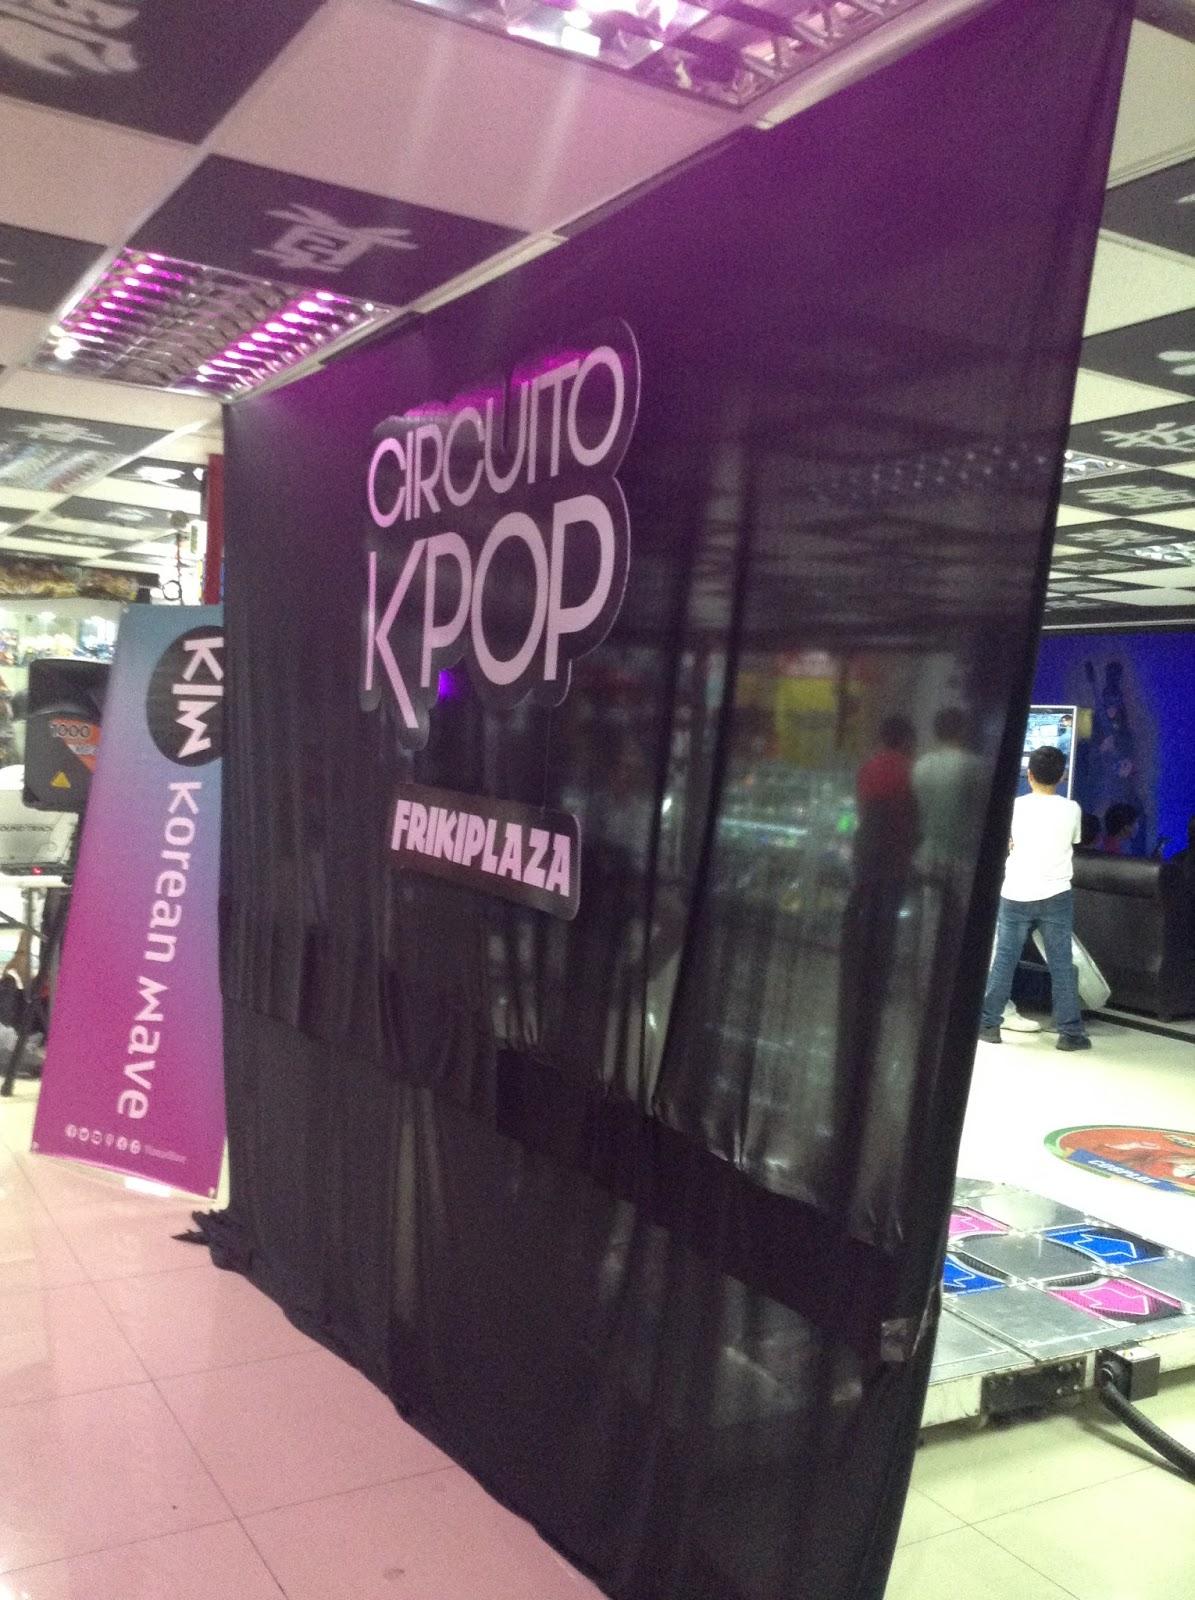 Circuito Kpop : Circuito kpop frikiplaza modo grupal u k pop mexico